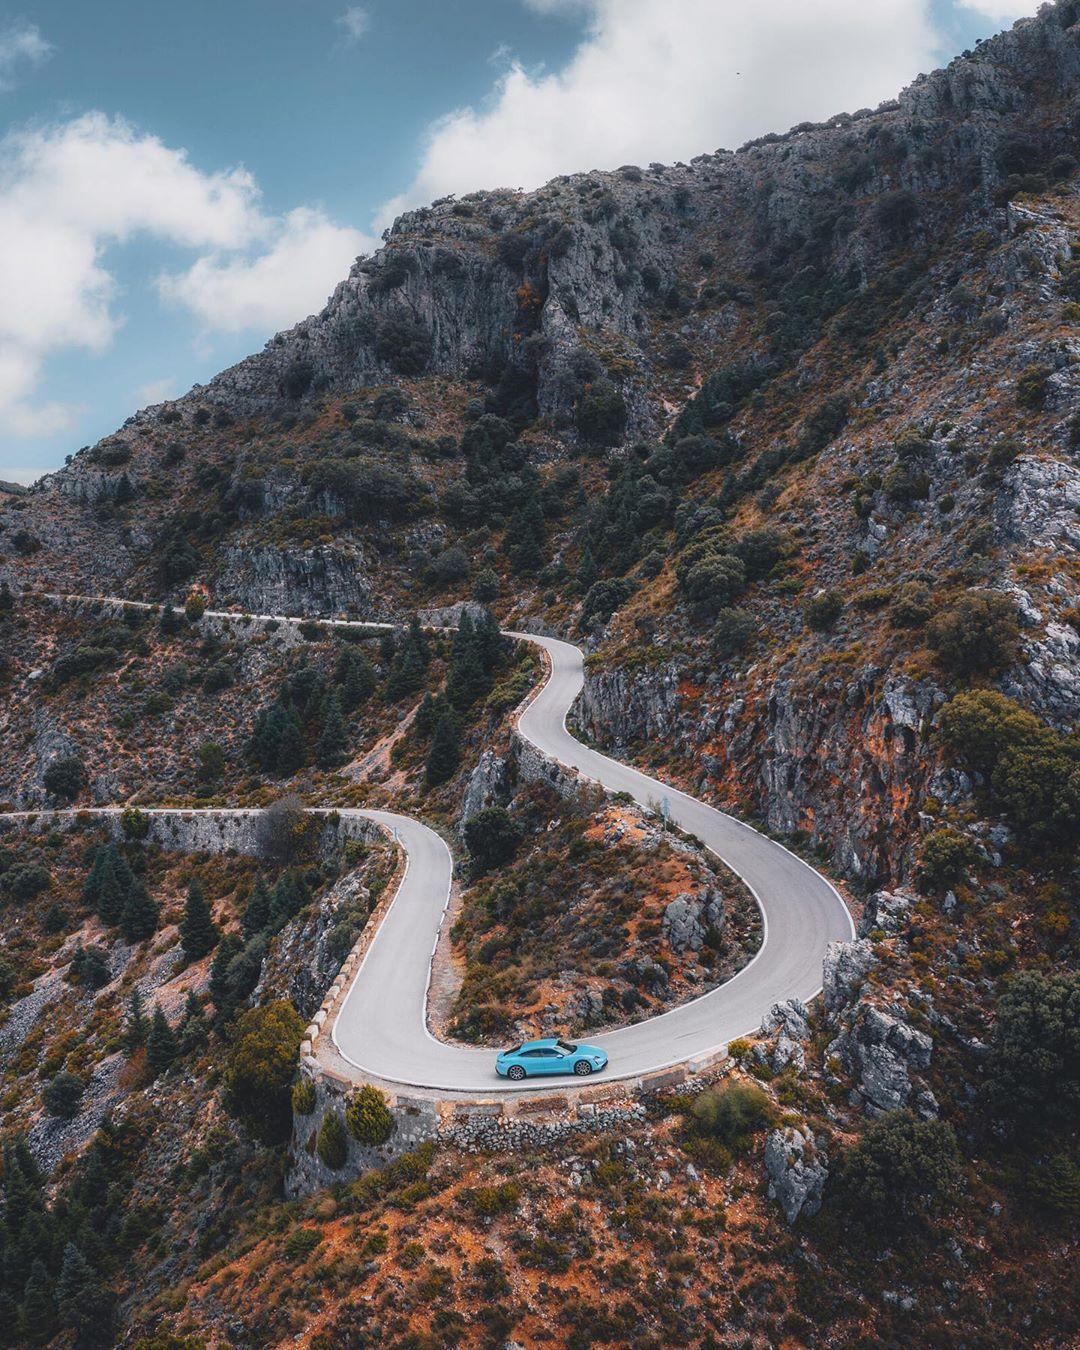 Путешествия и приключения на снимках Леннарта Пагеля